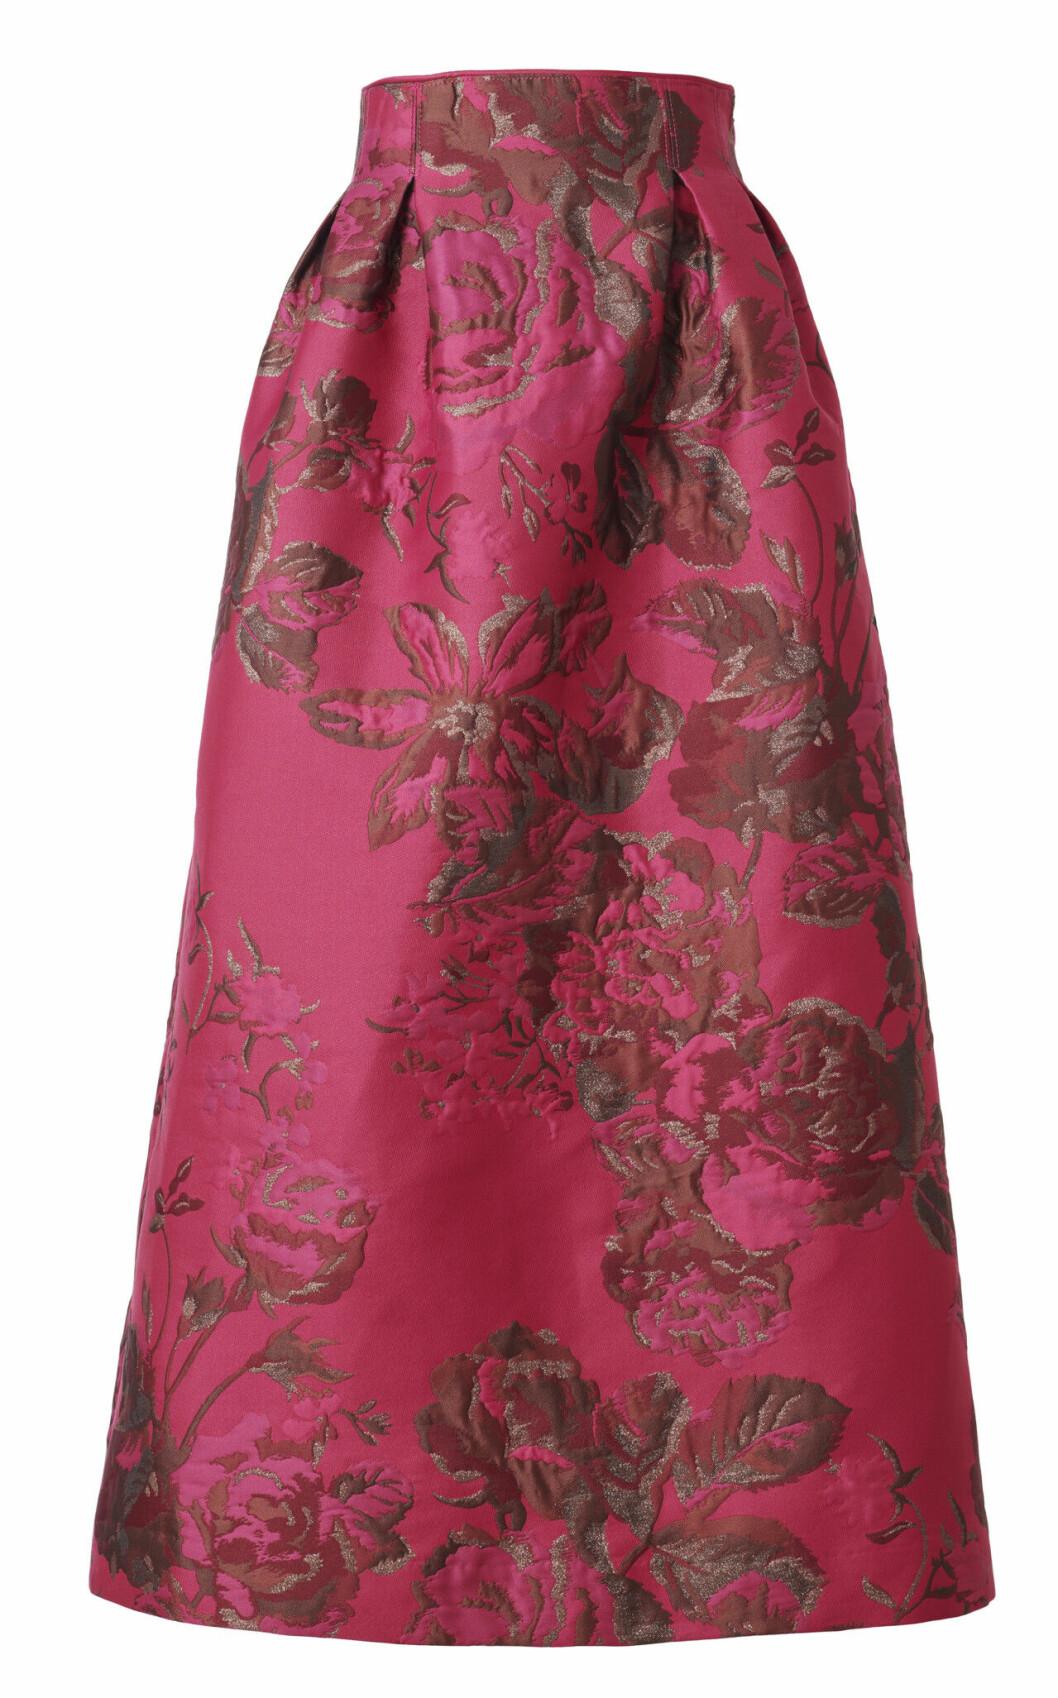 H&M Conscious Exclusive AW19 –blommig kjol